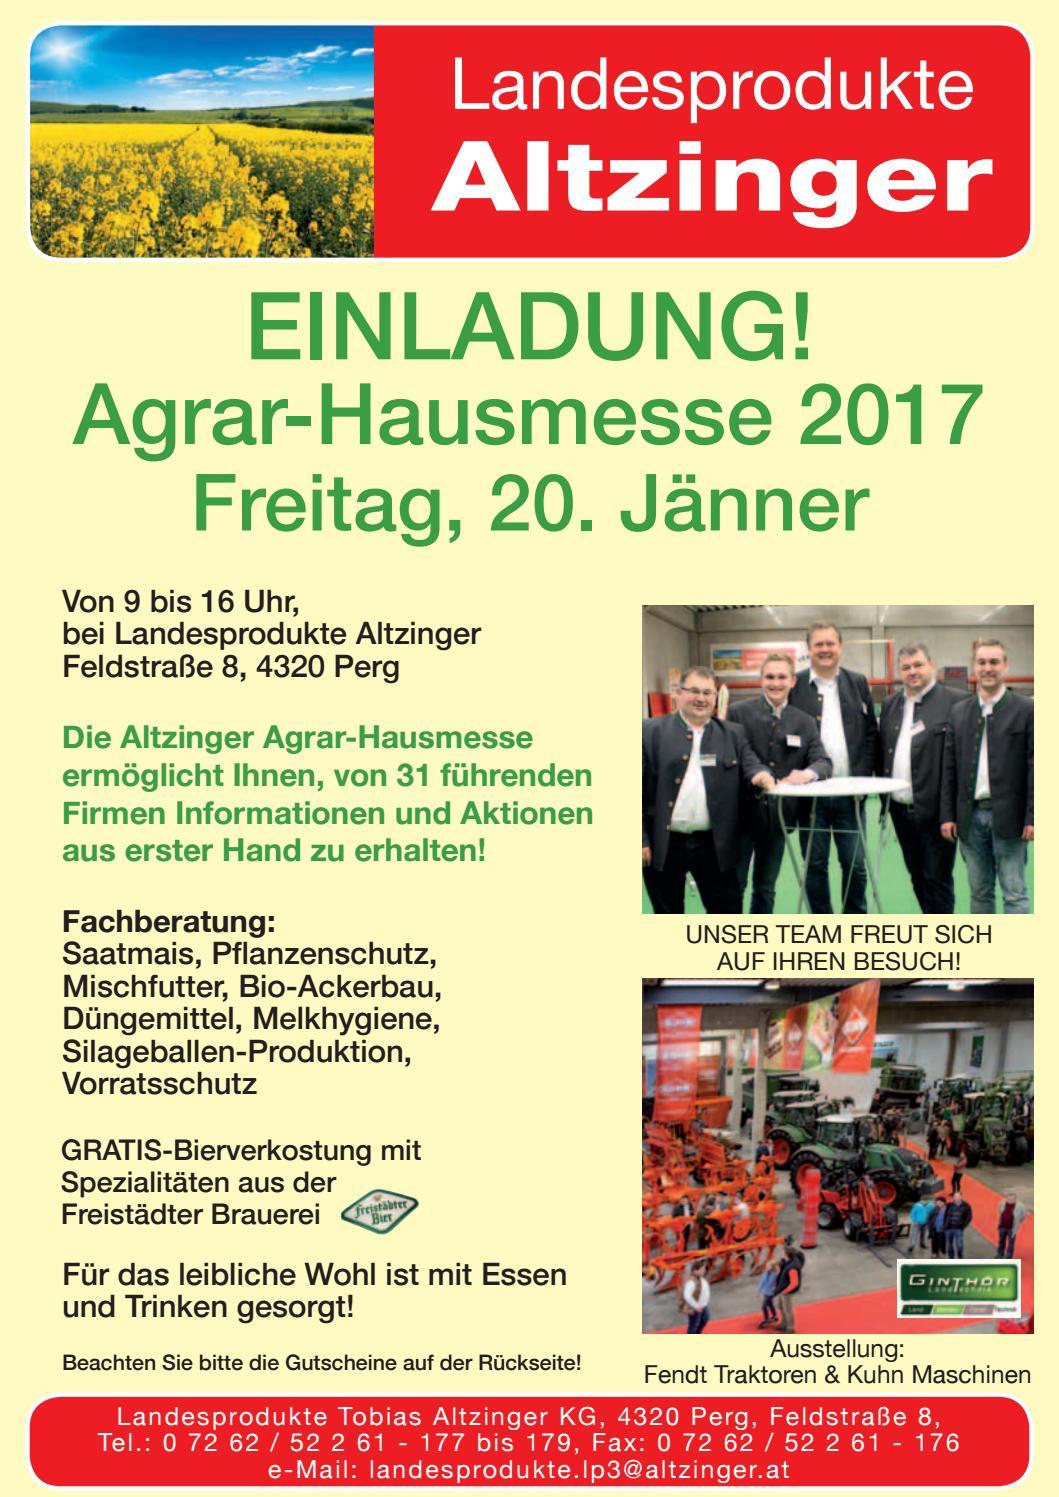 altzinger einladung - agrartag 2017 by busta + neumayr og - issuu, Einladung